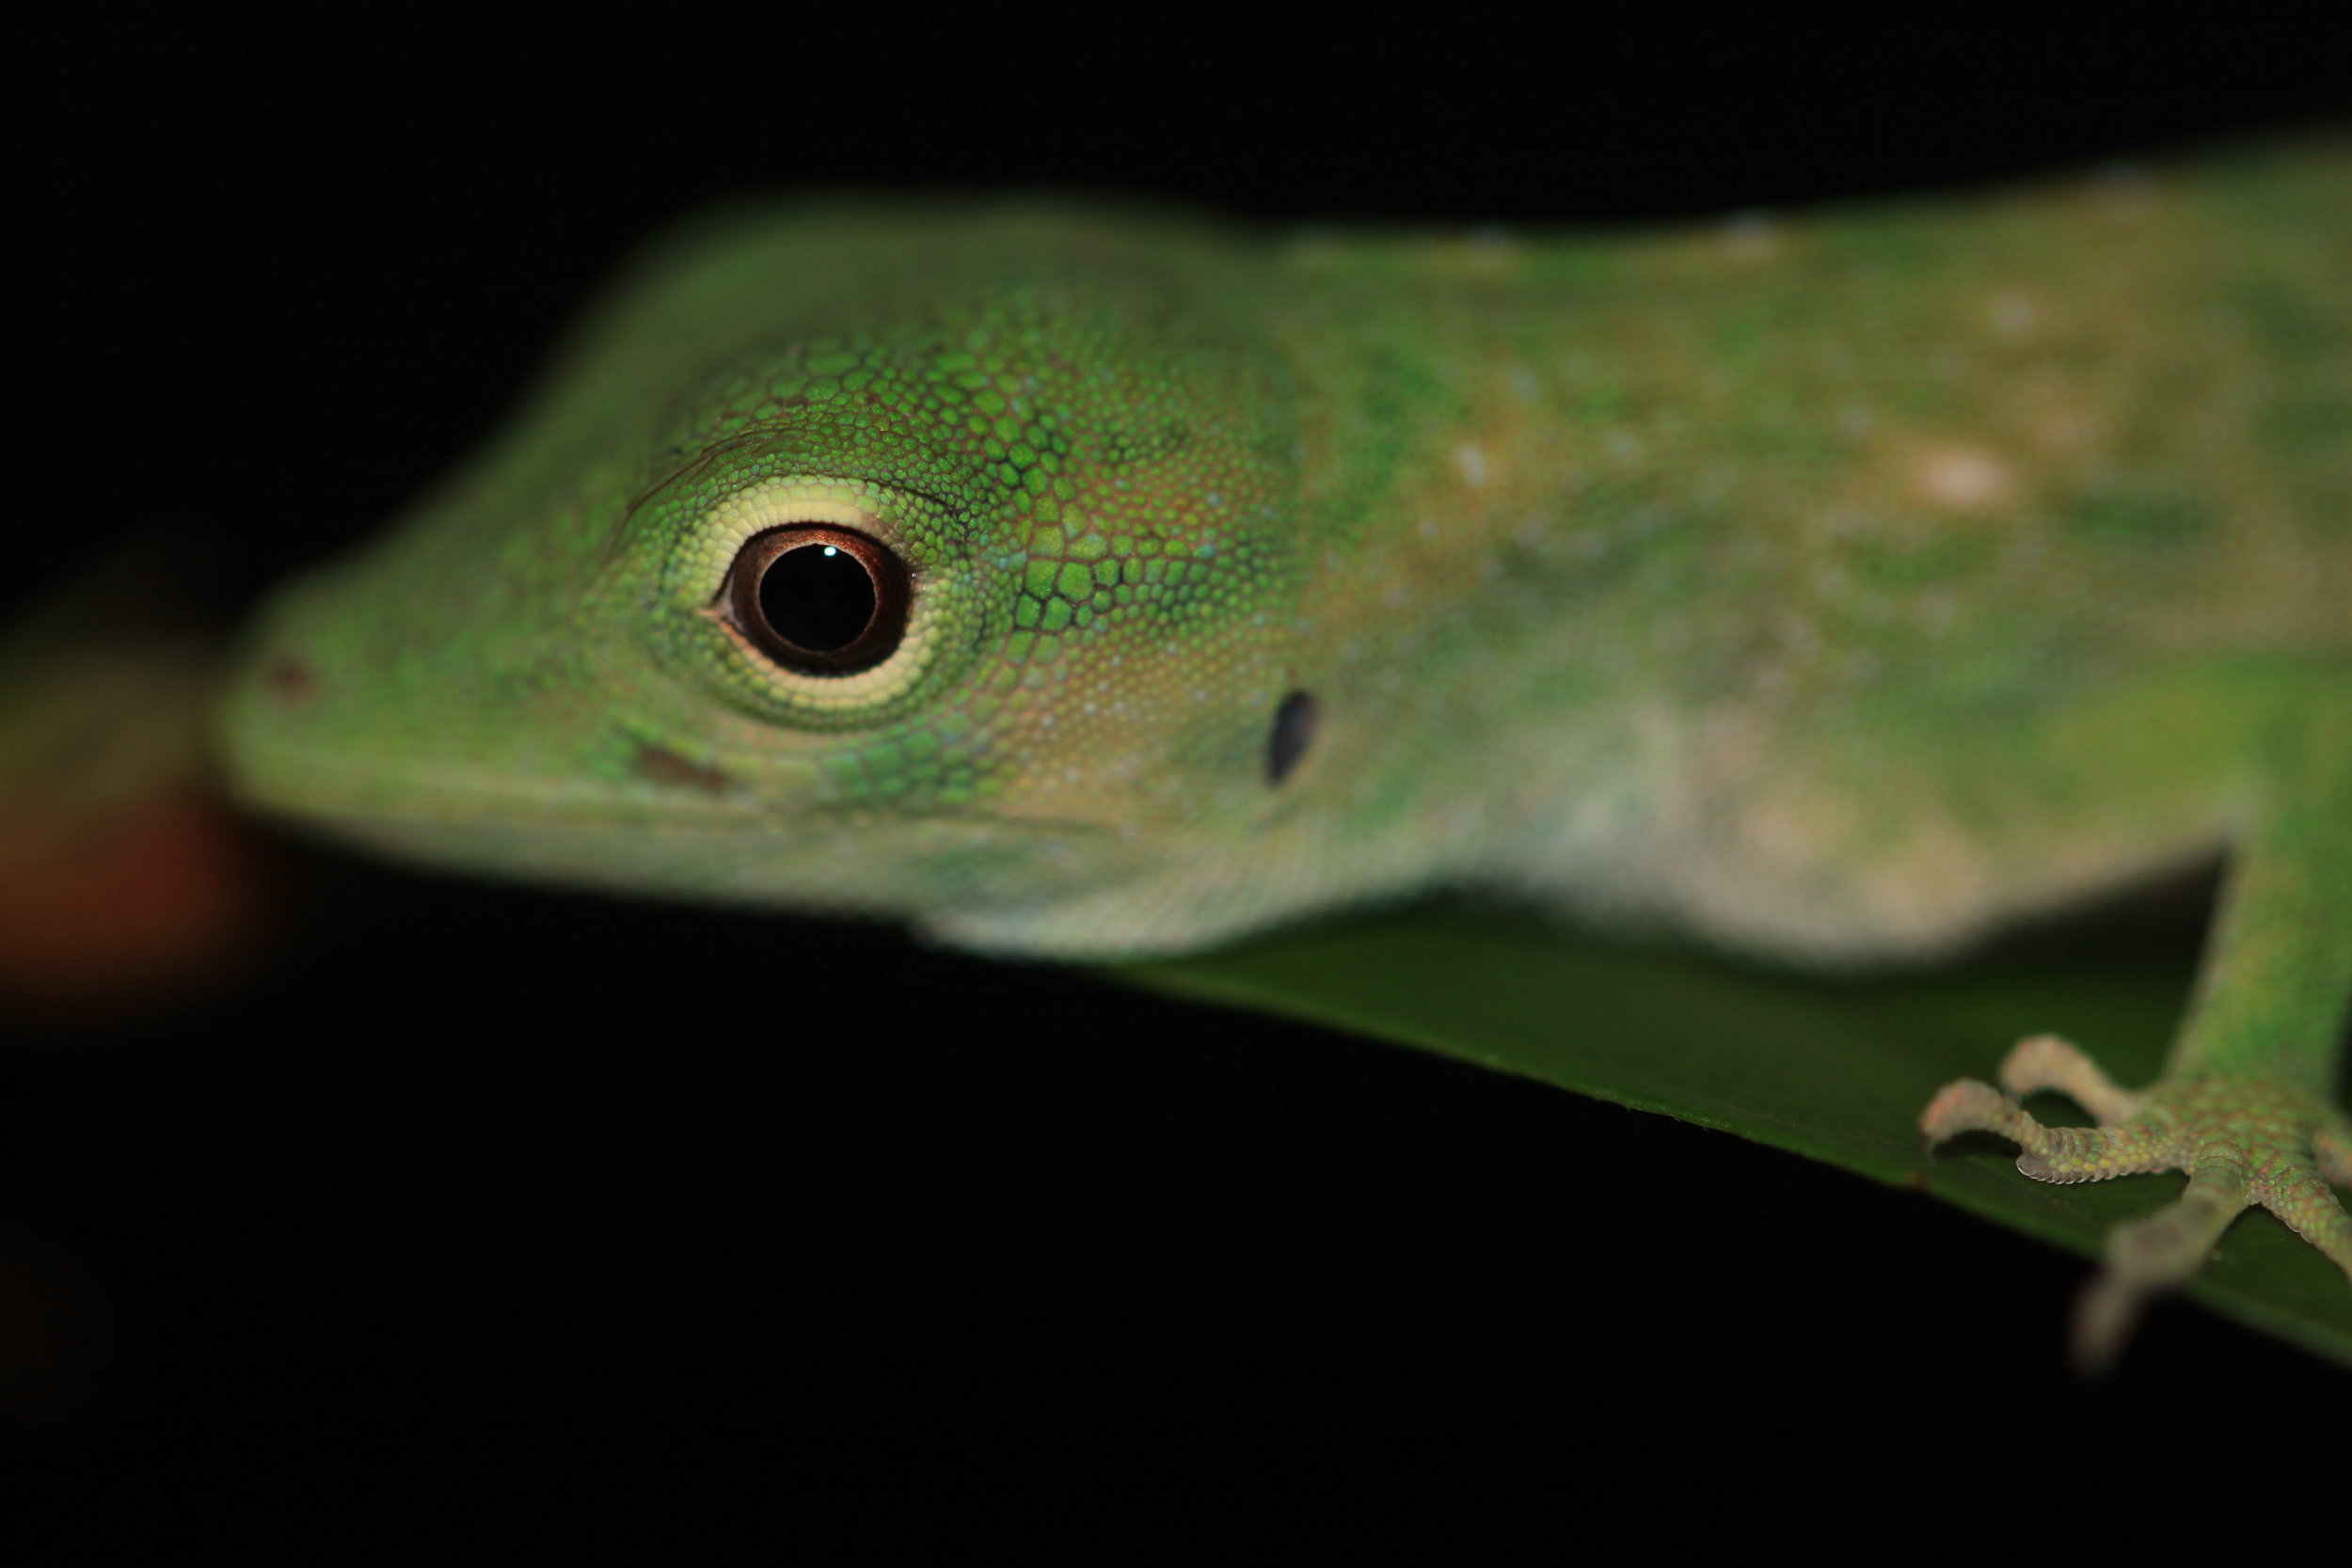 green-anole-up-close.jpg